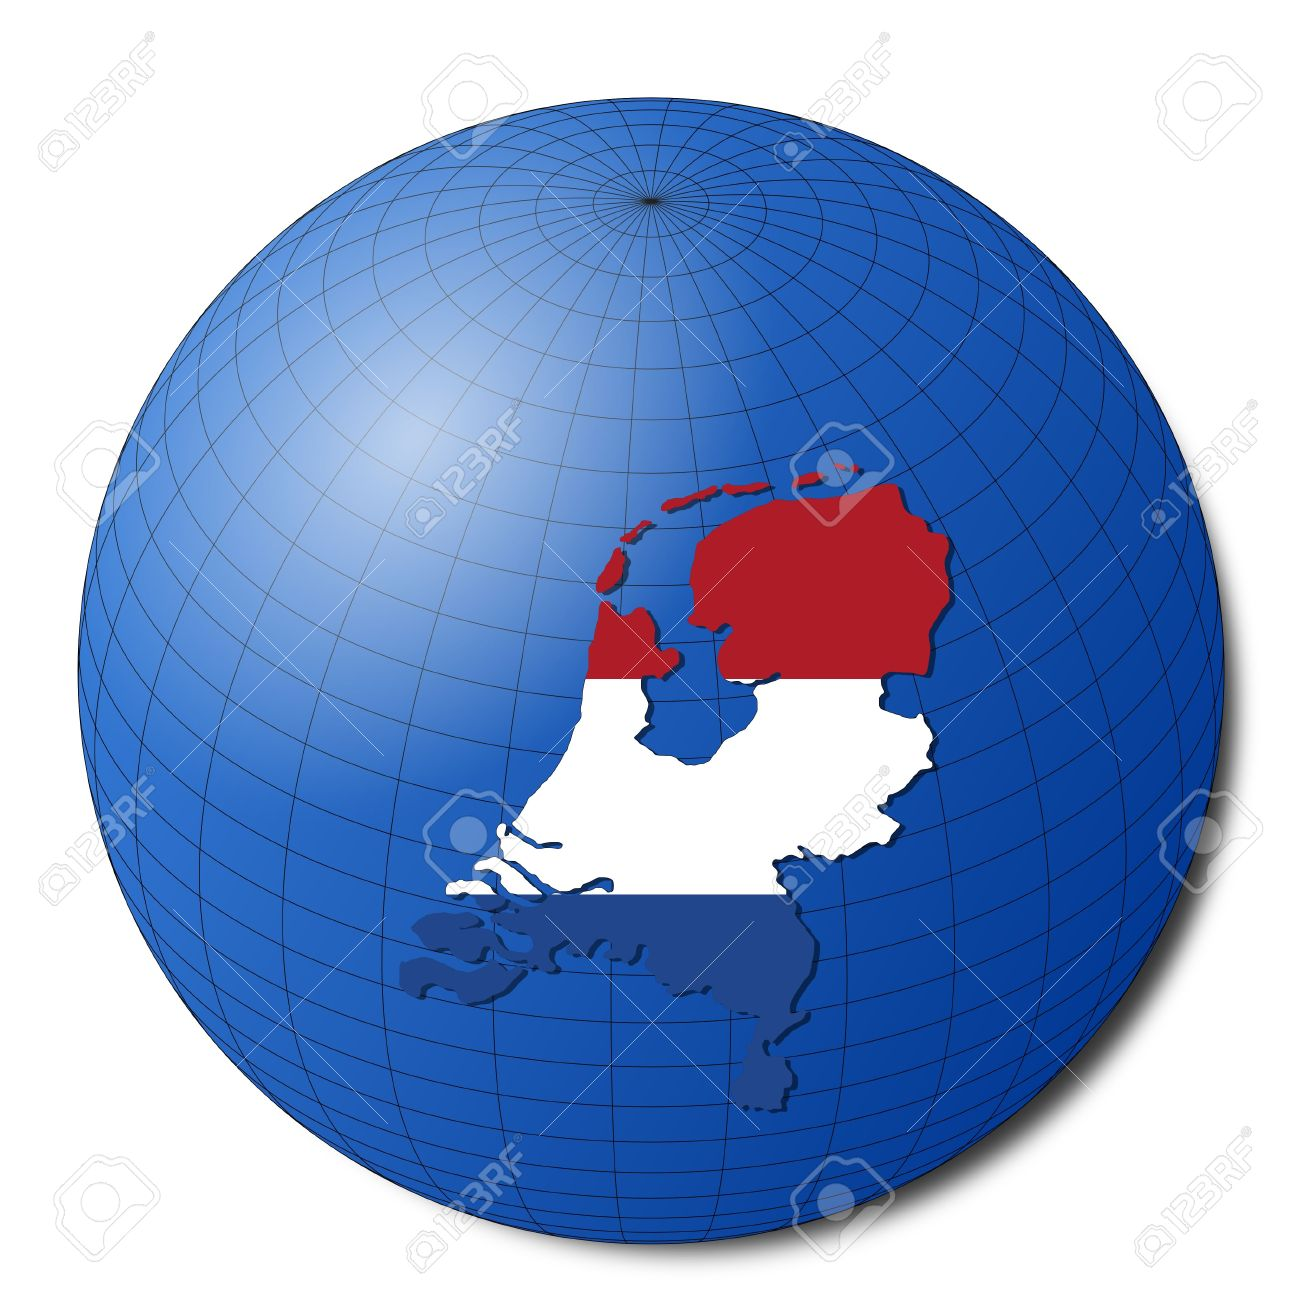 Netherlands Map Flag On Abstract Globe Illustration Stock Photo